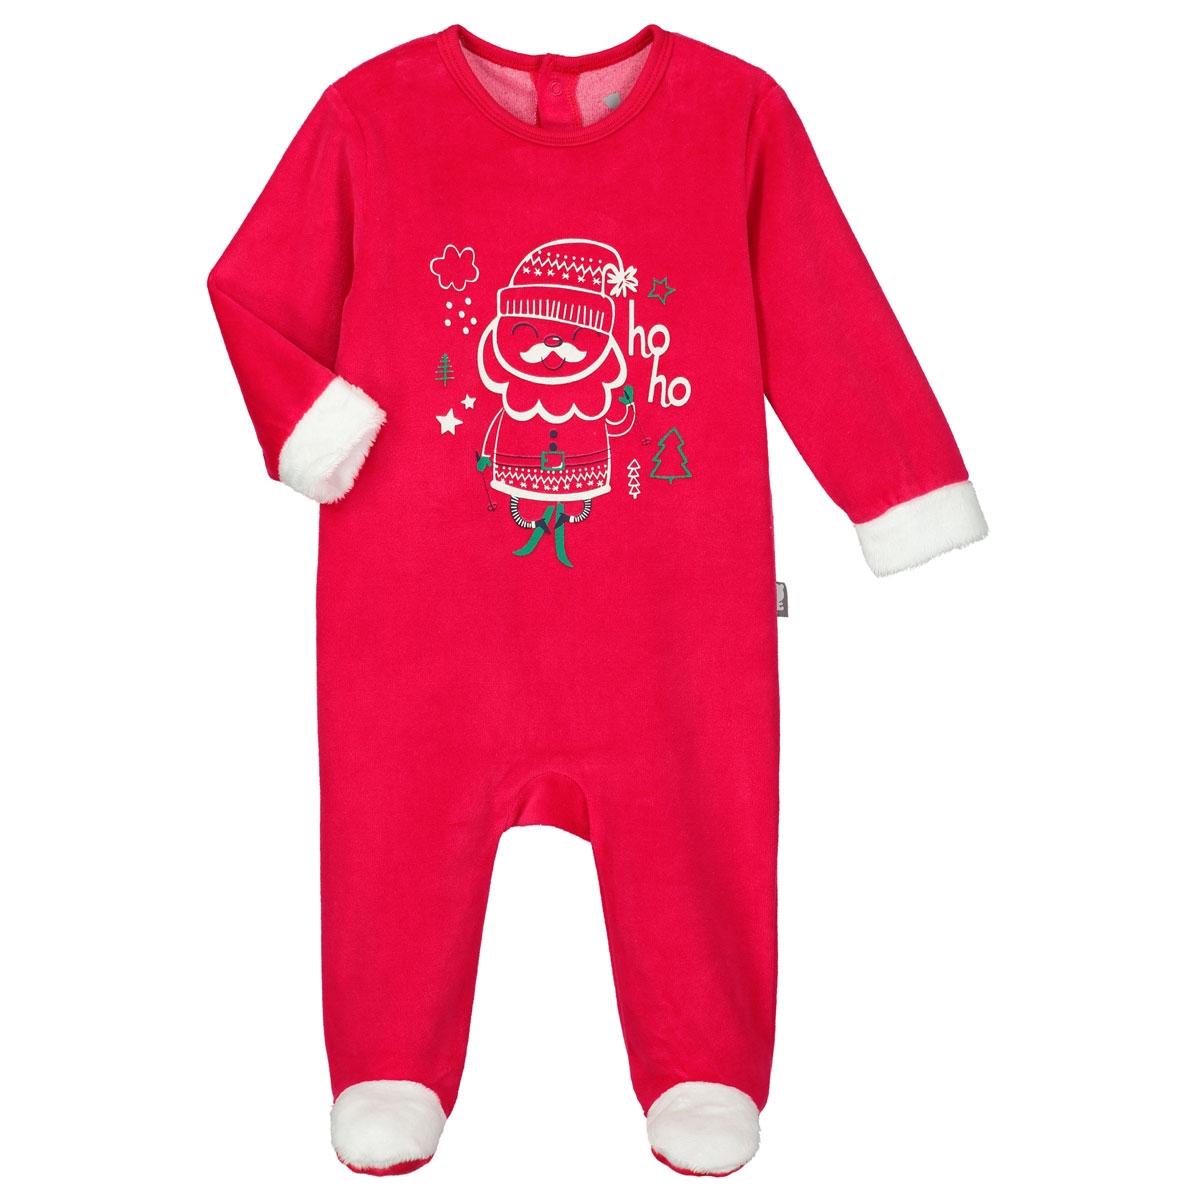 85eaaed950fc5 Pyjama bébé velours Hoho - PETIT BEGUIN